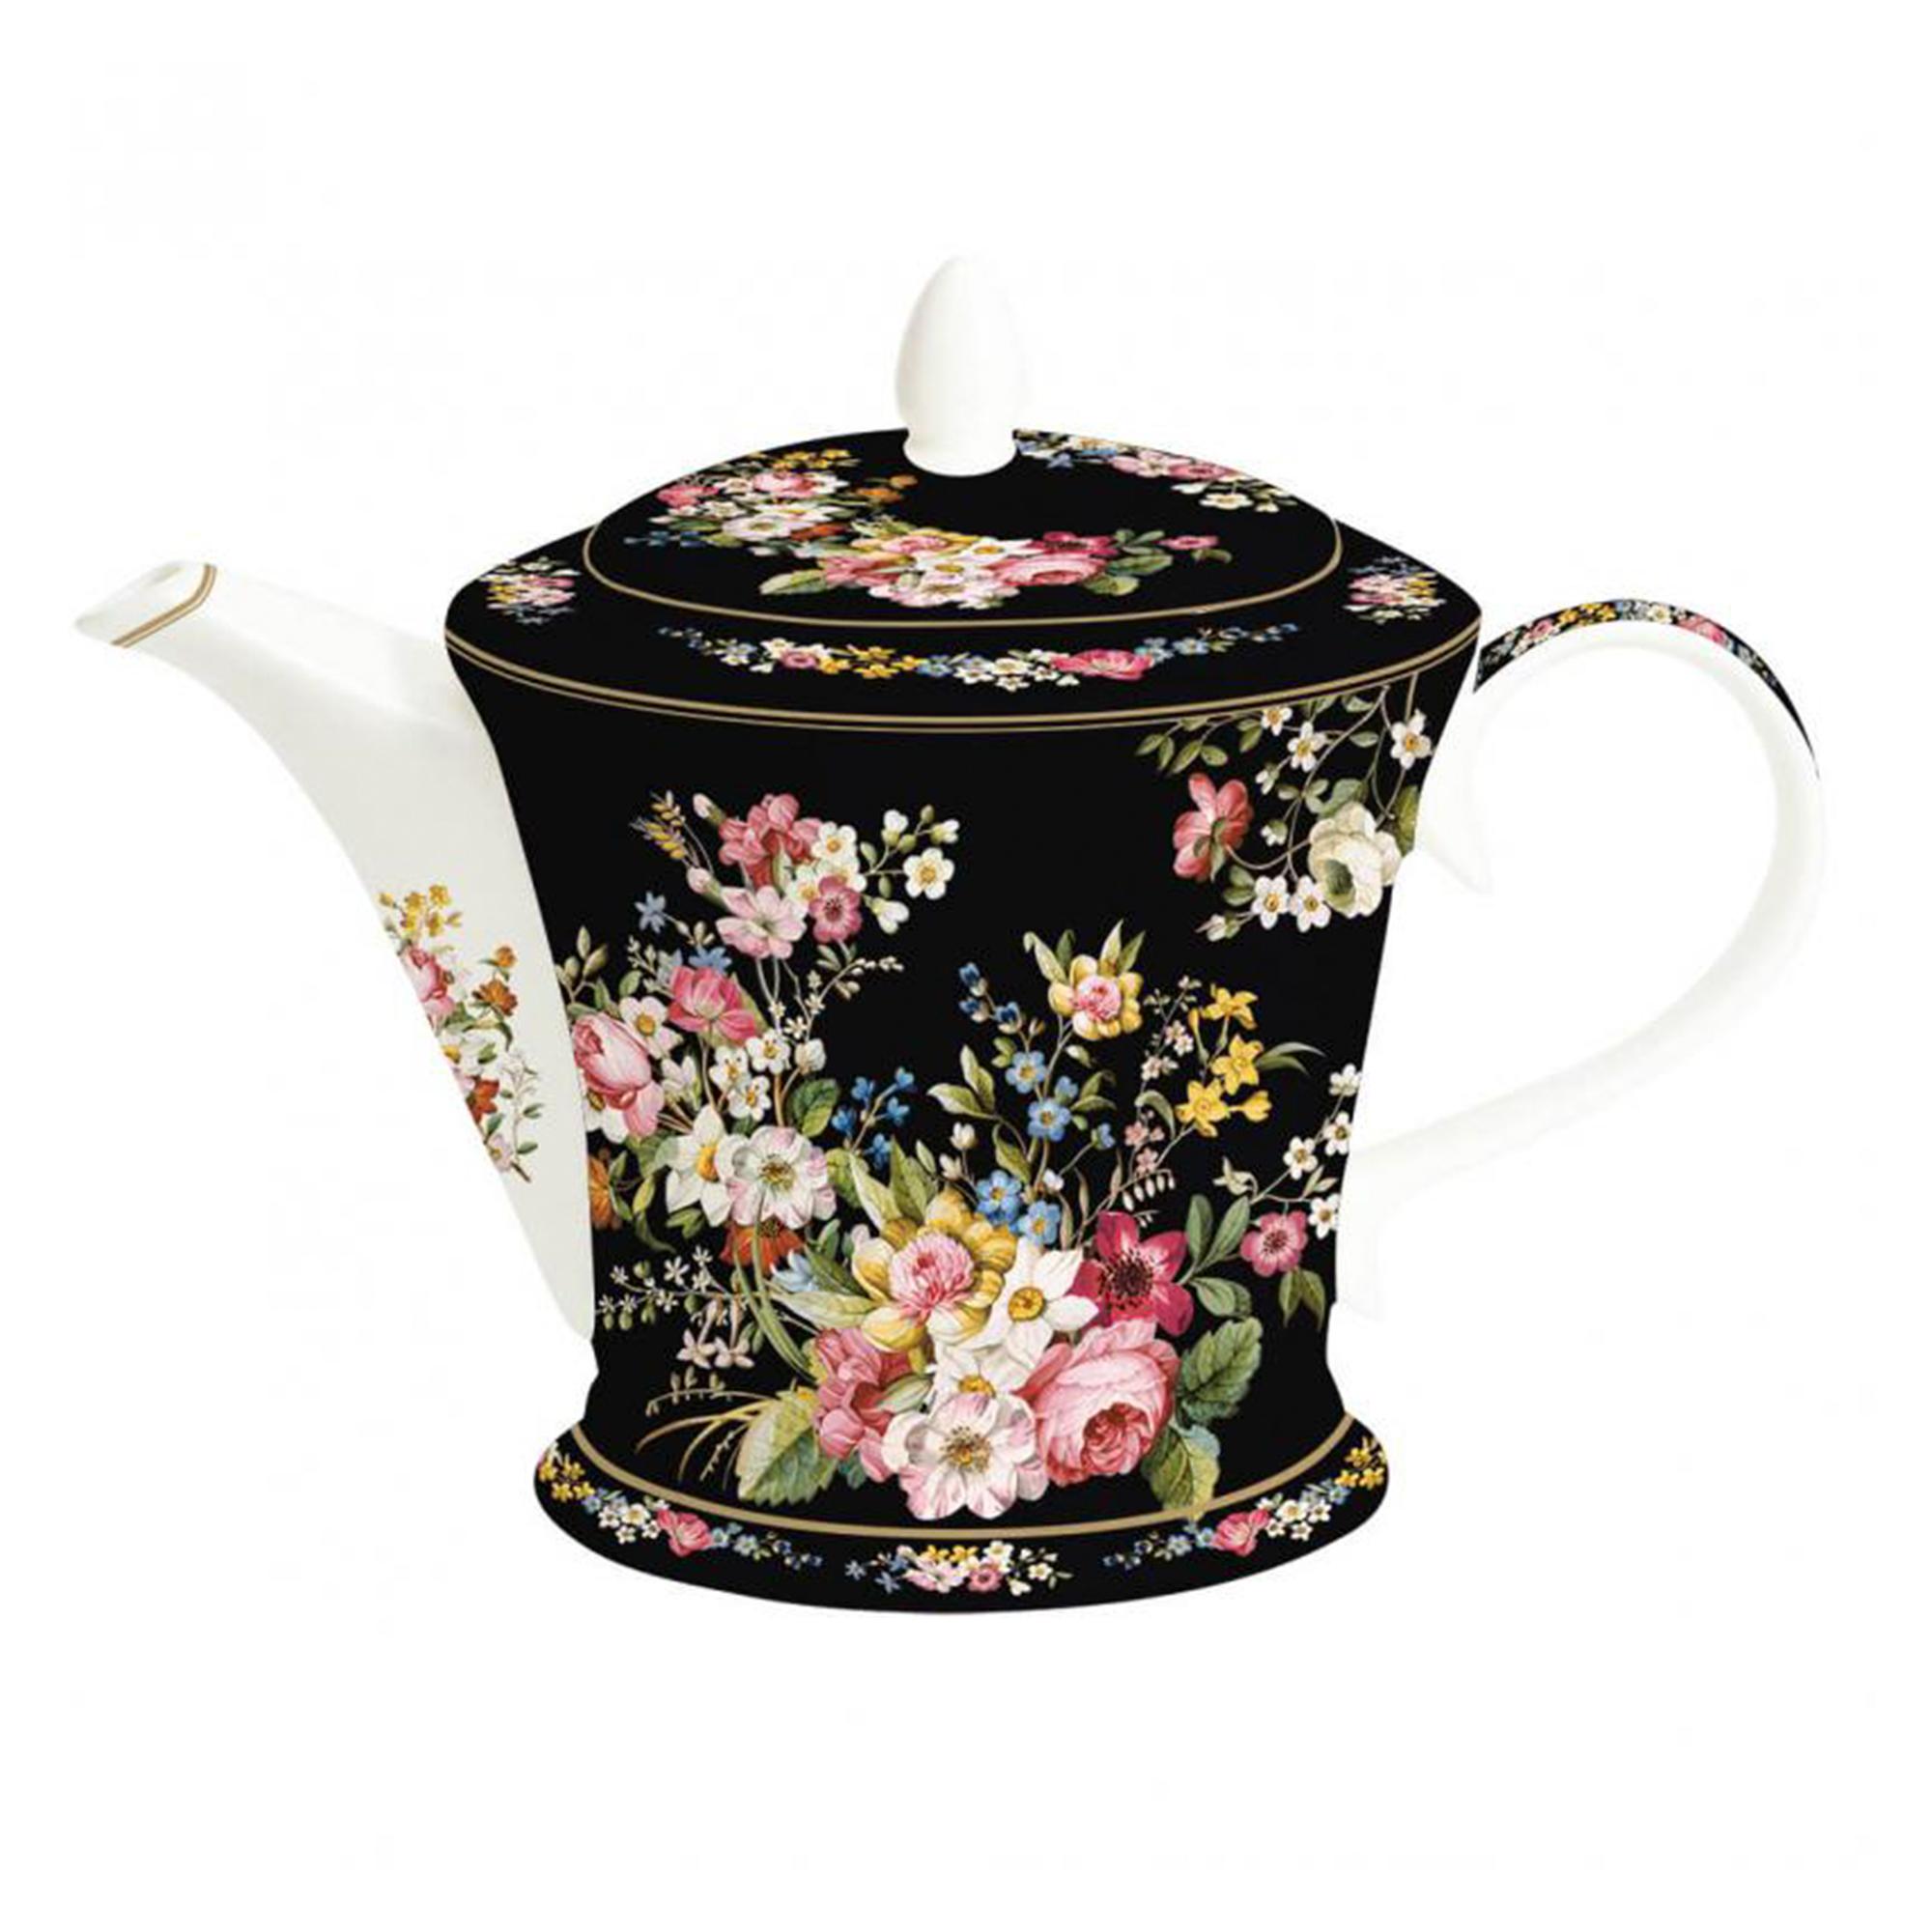 Чайник заварочный Nuova R2S Цветочный Карнавал 1 л заварочный чайник 1 5 л lilac 5520010 1